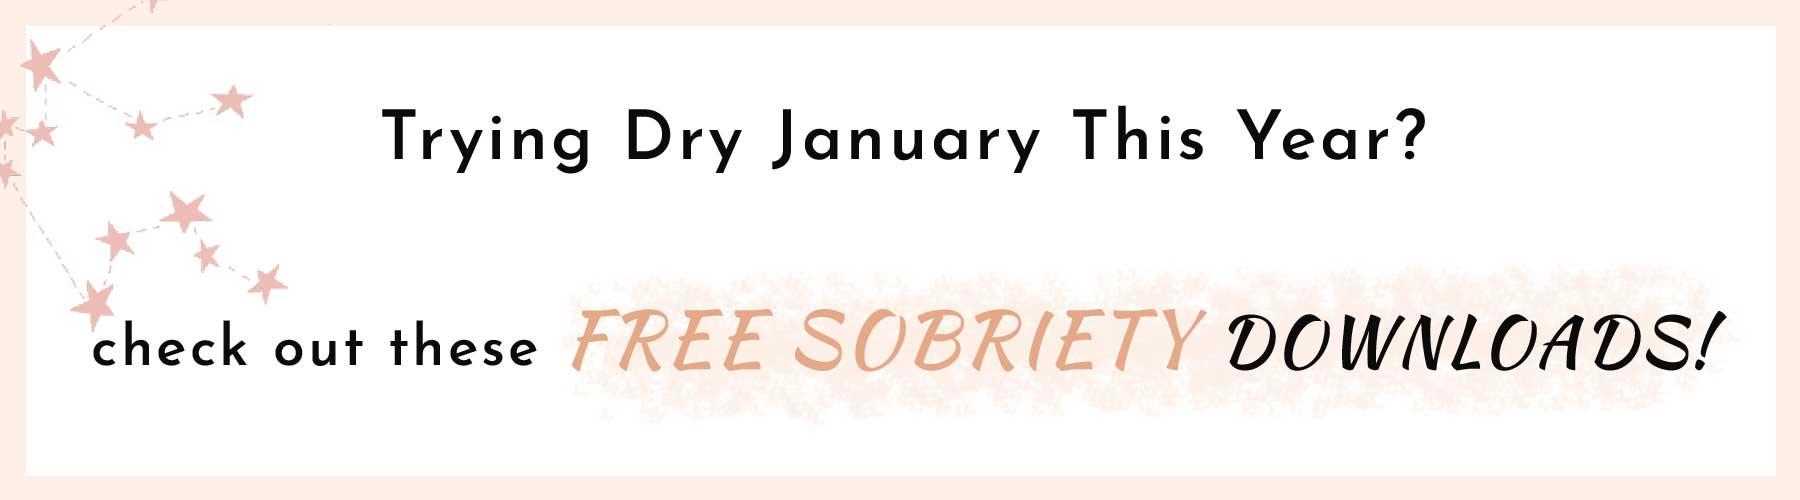 dry january downloads